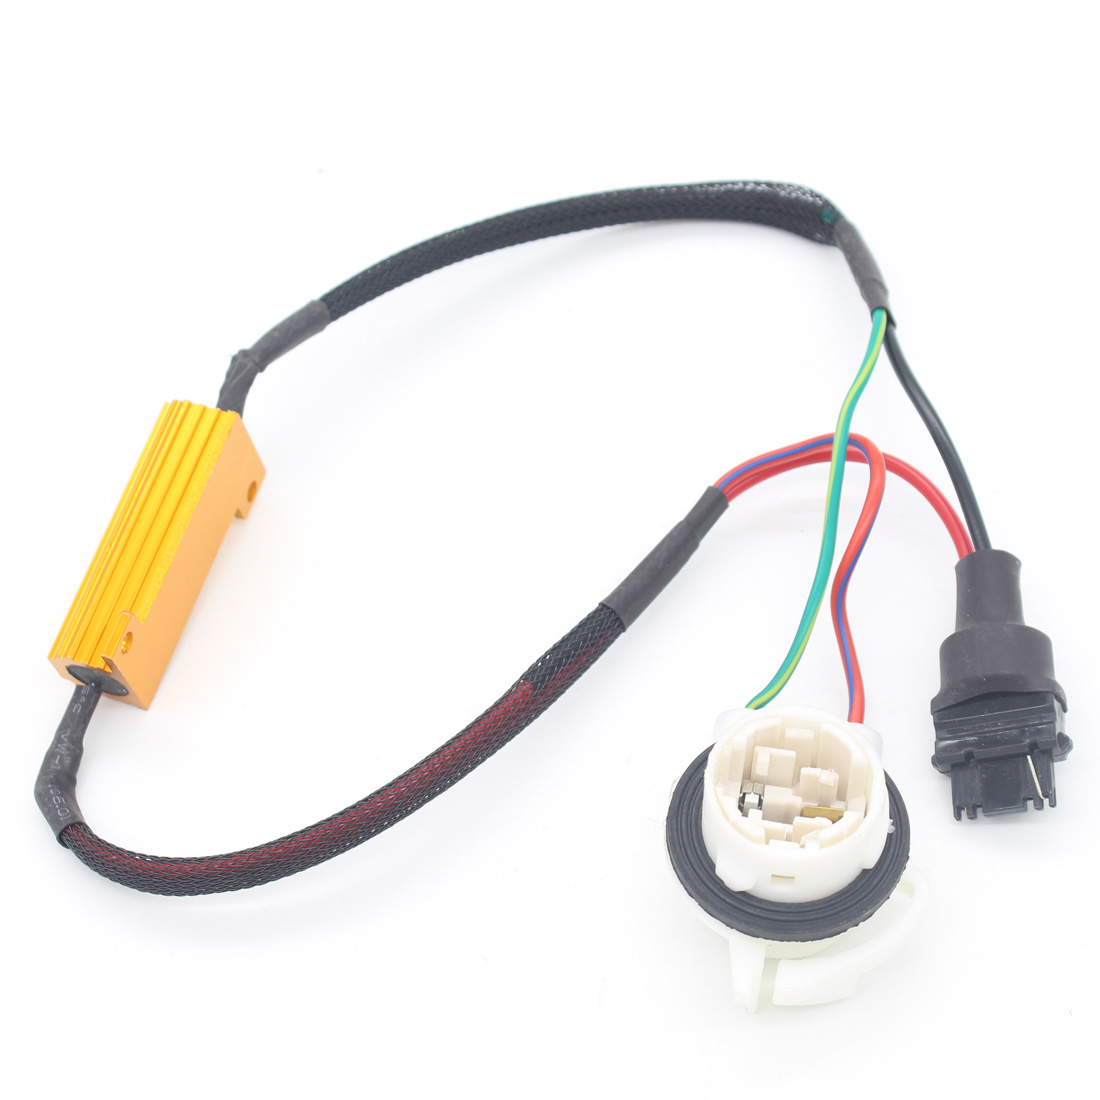 Car LED Fog Light lamp Load Resistor Canbus Error Free Wiring Canceller Decoder H11 Car Styling Motorbike DRL Xenon HID 2x car 1157 bay15d 1034 warning canceller error free load resistor led decoder